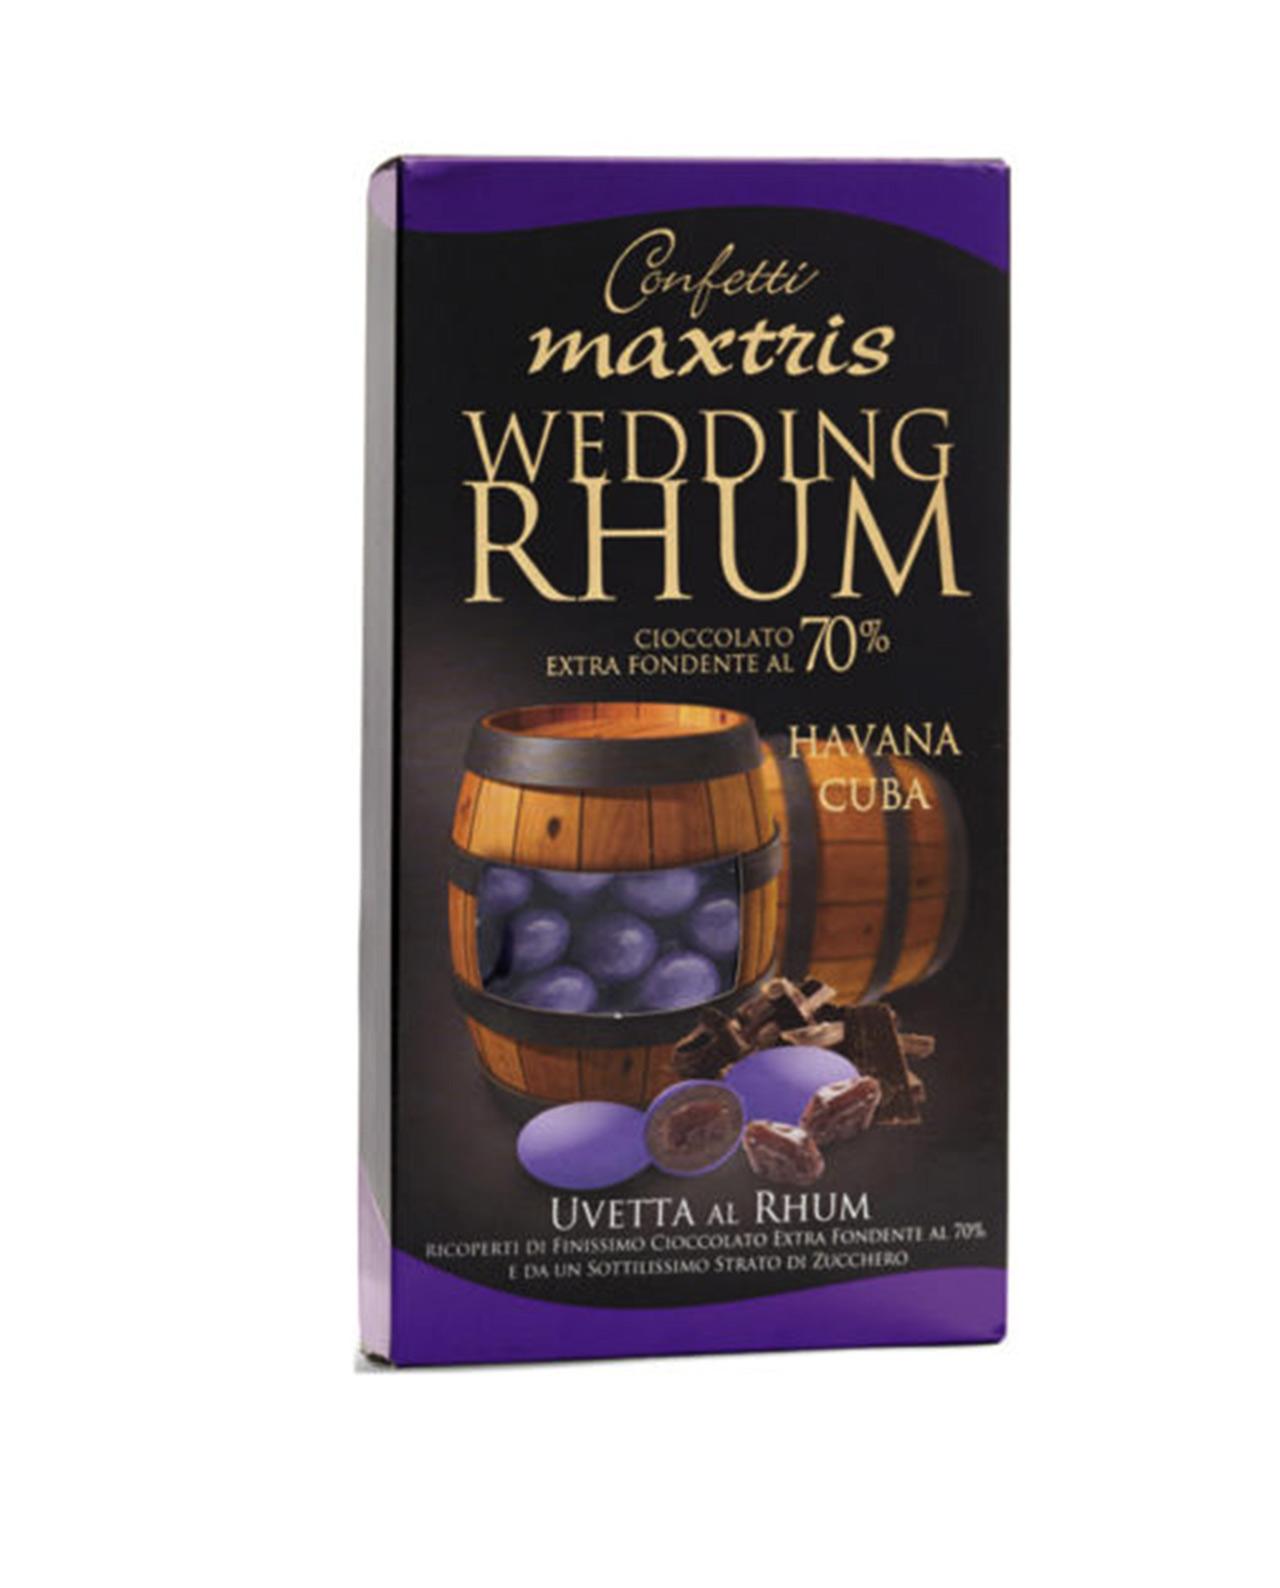 Confetti maxtris uvetta wedding rhum mobilia store home for Mobilia wedding